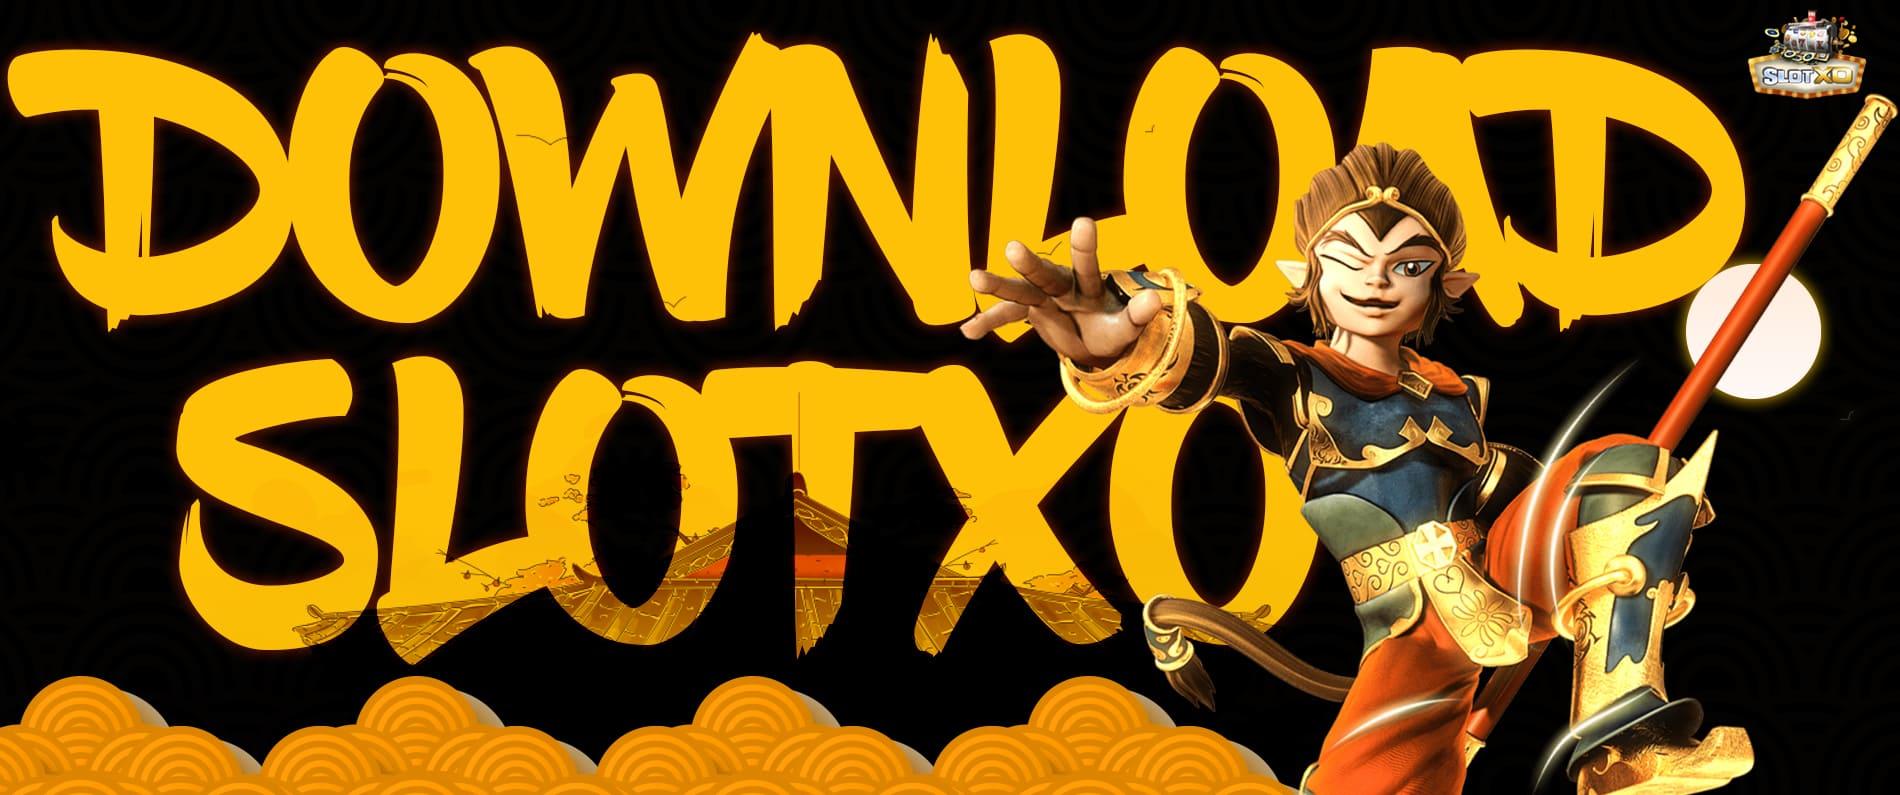 Download Slotxo ทางเข้าslotxo ดาวน์โหลดslotxo